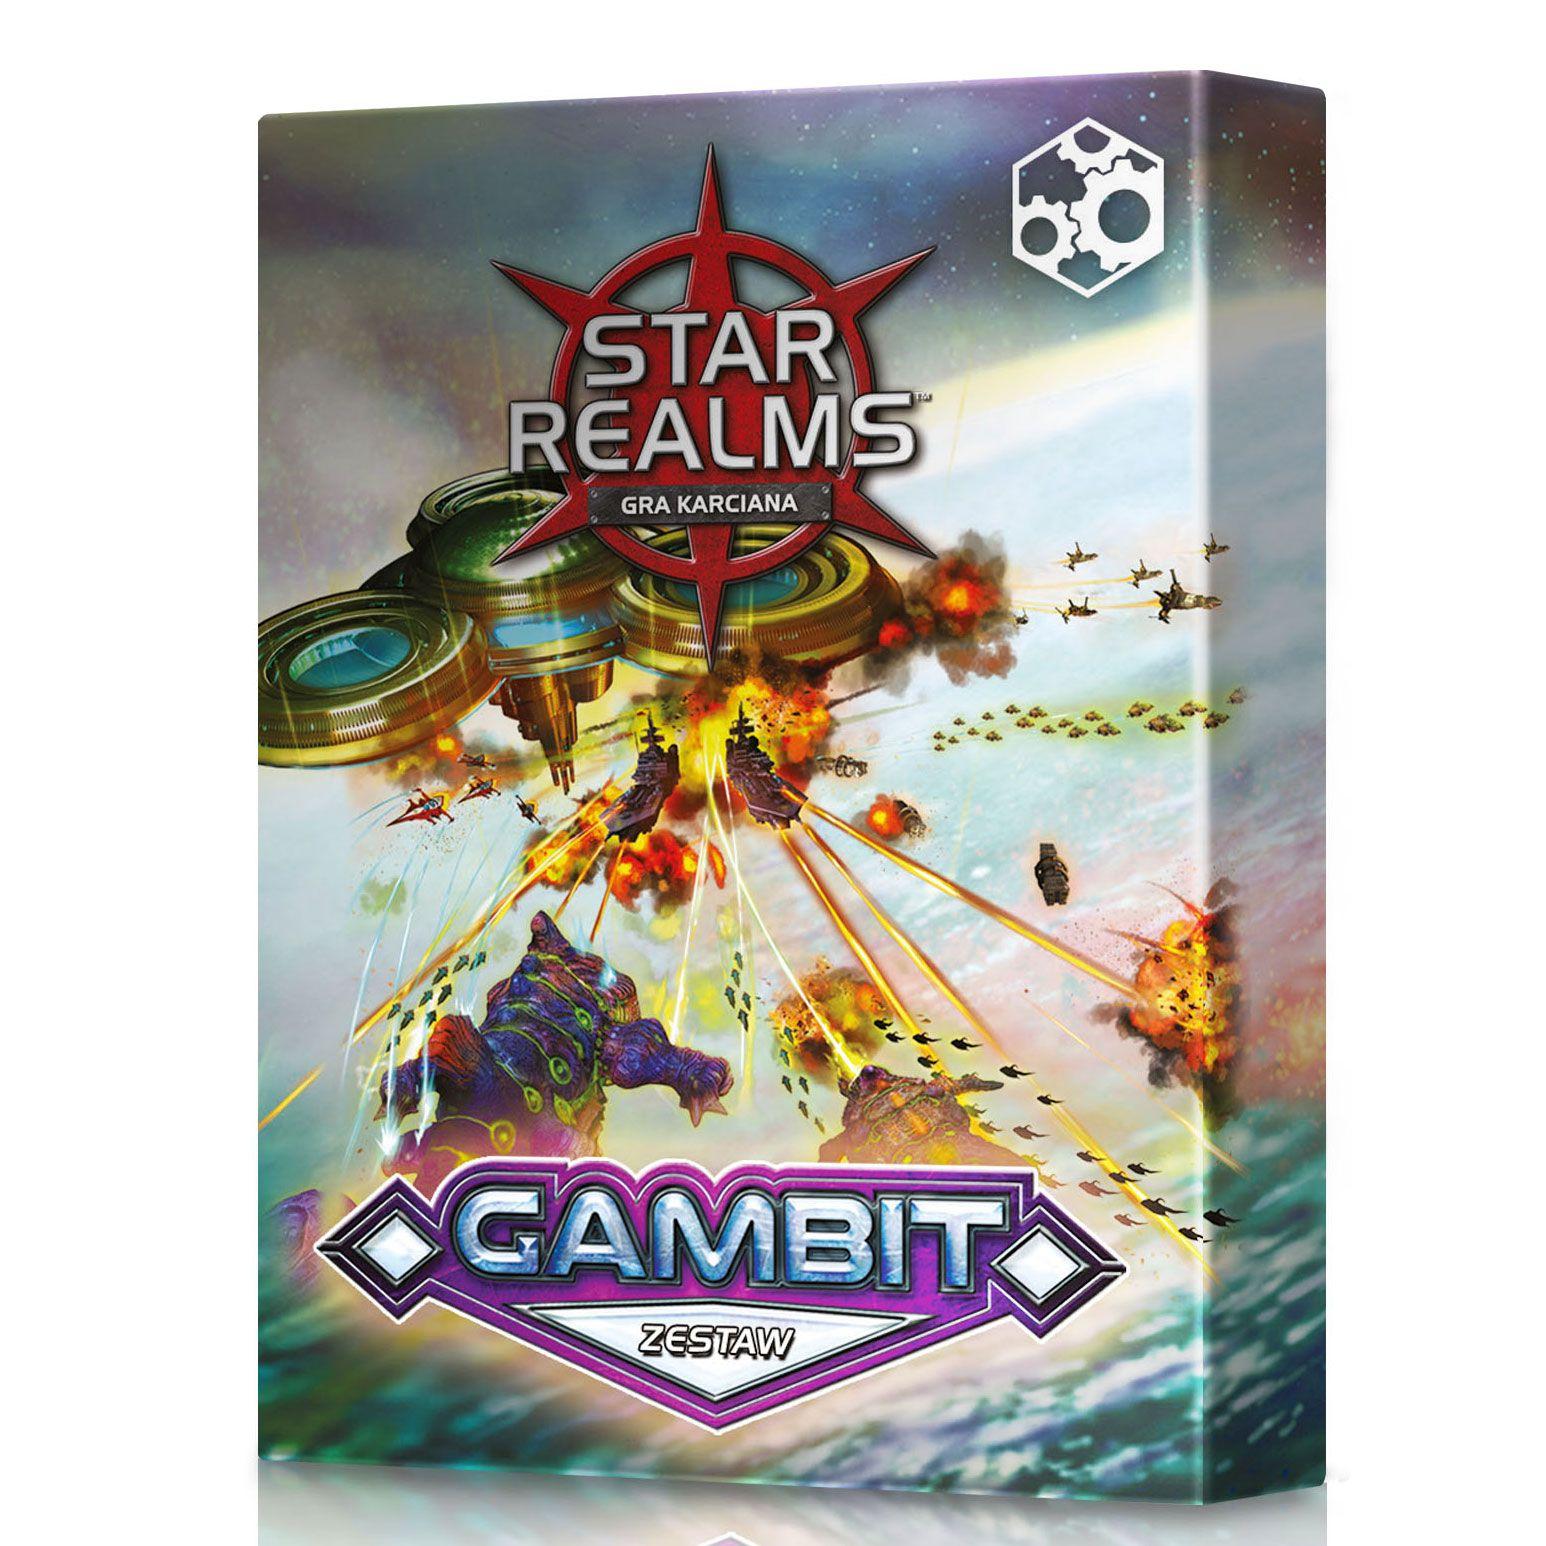 Star Realms: Gambit